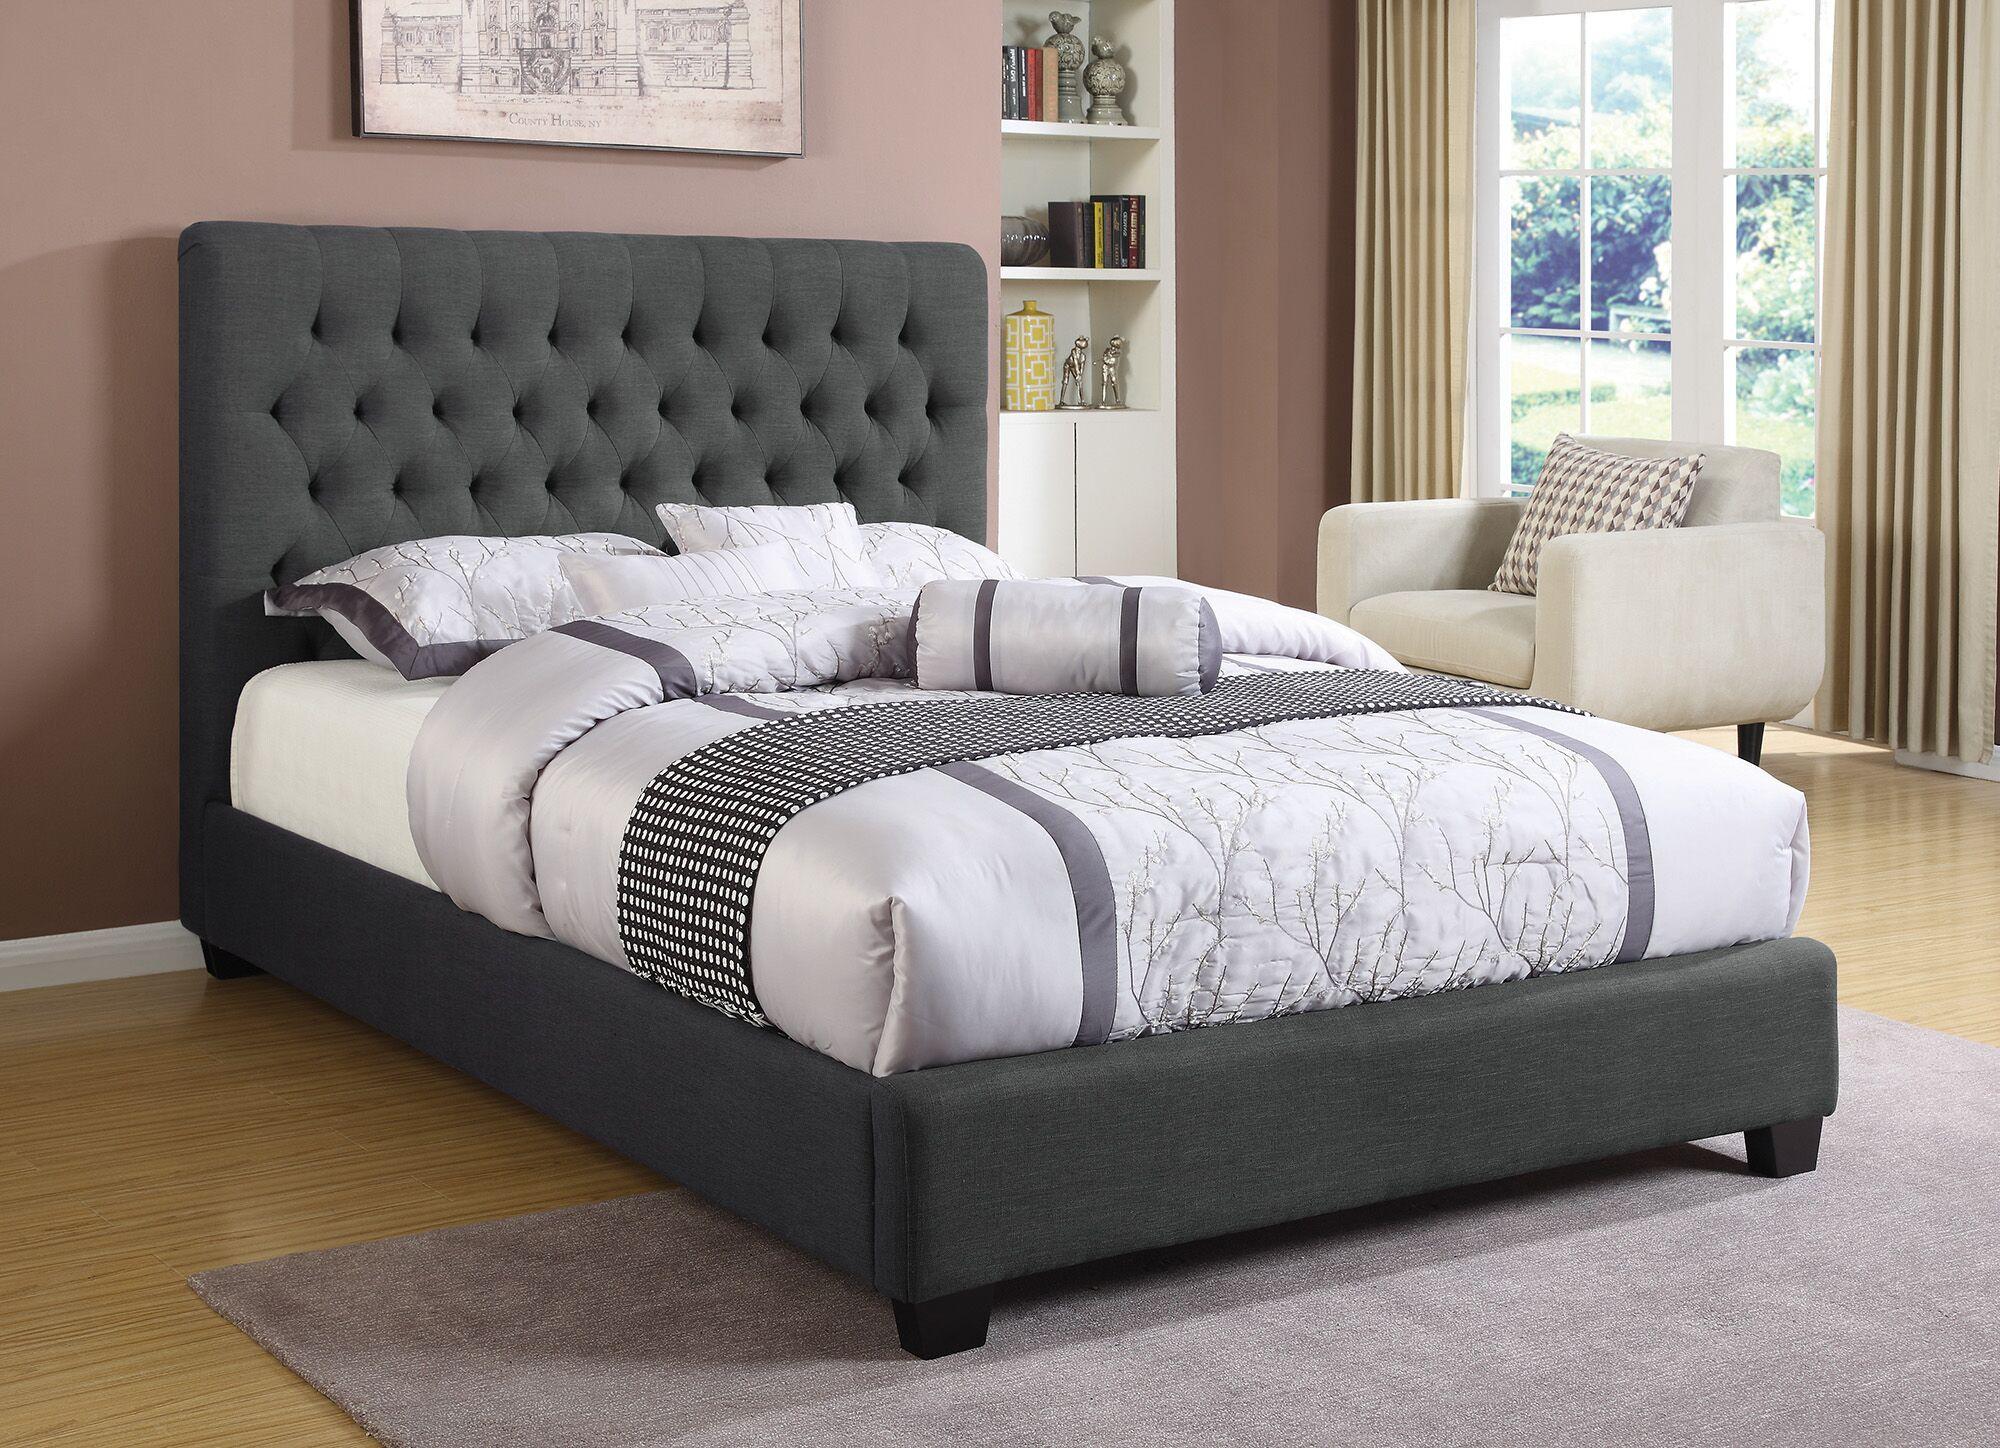 Christen Upholstered Panel Bed Size: Eastern King, Color: Charcoal